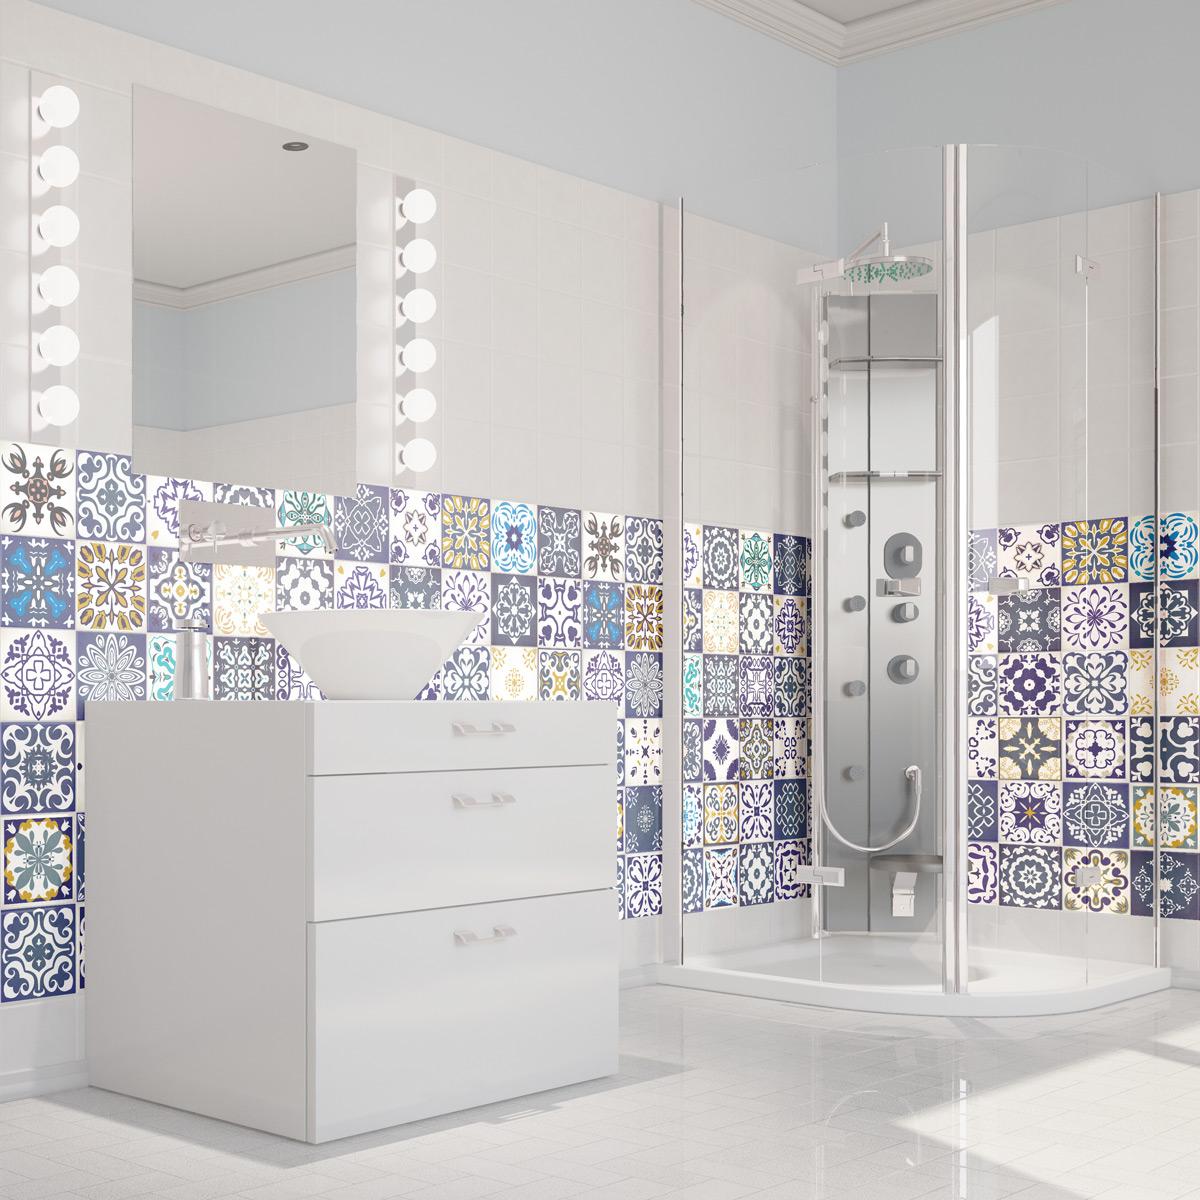 Salle De Bain Azulejos ~ 60 stickers carrelages azulejos cyprus salle de bain et wc salle